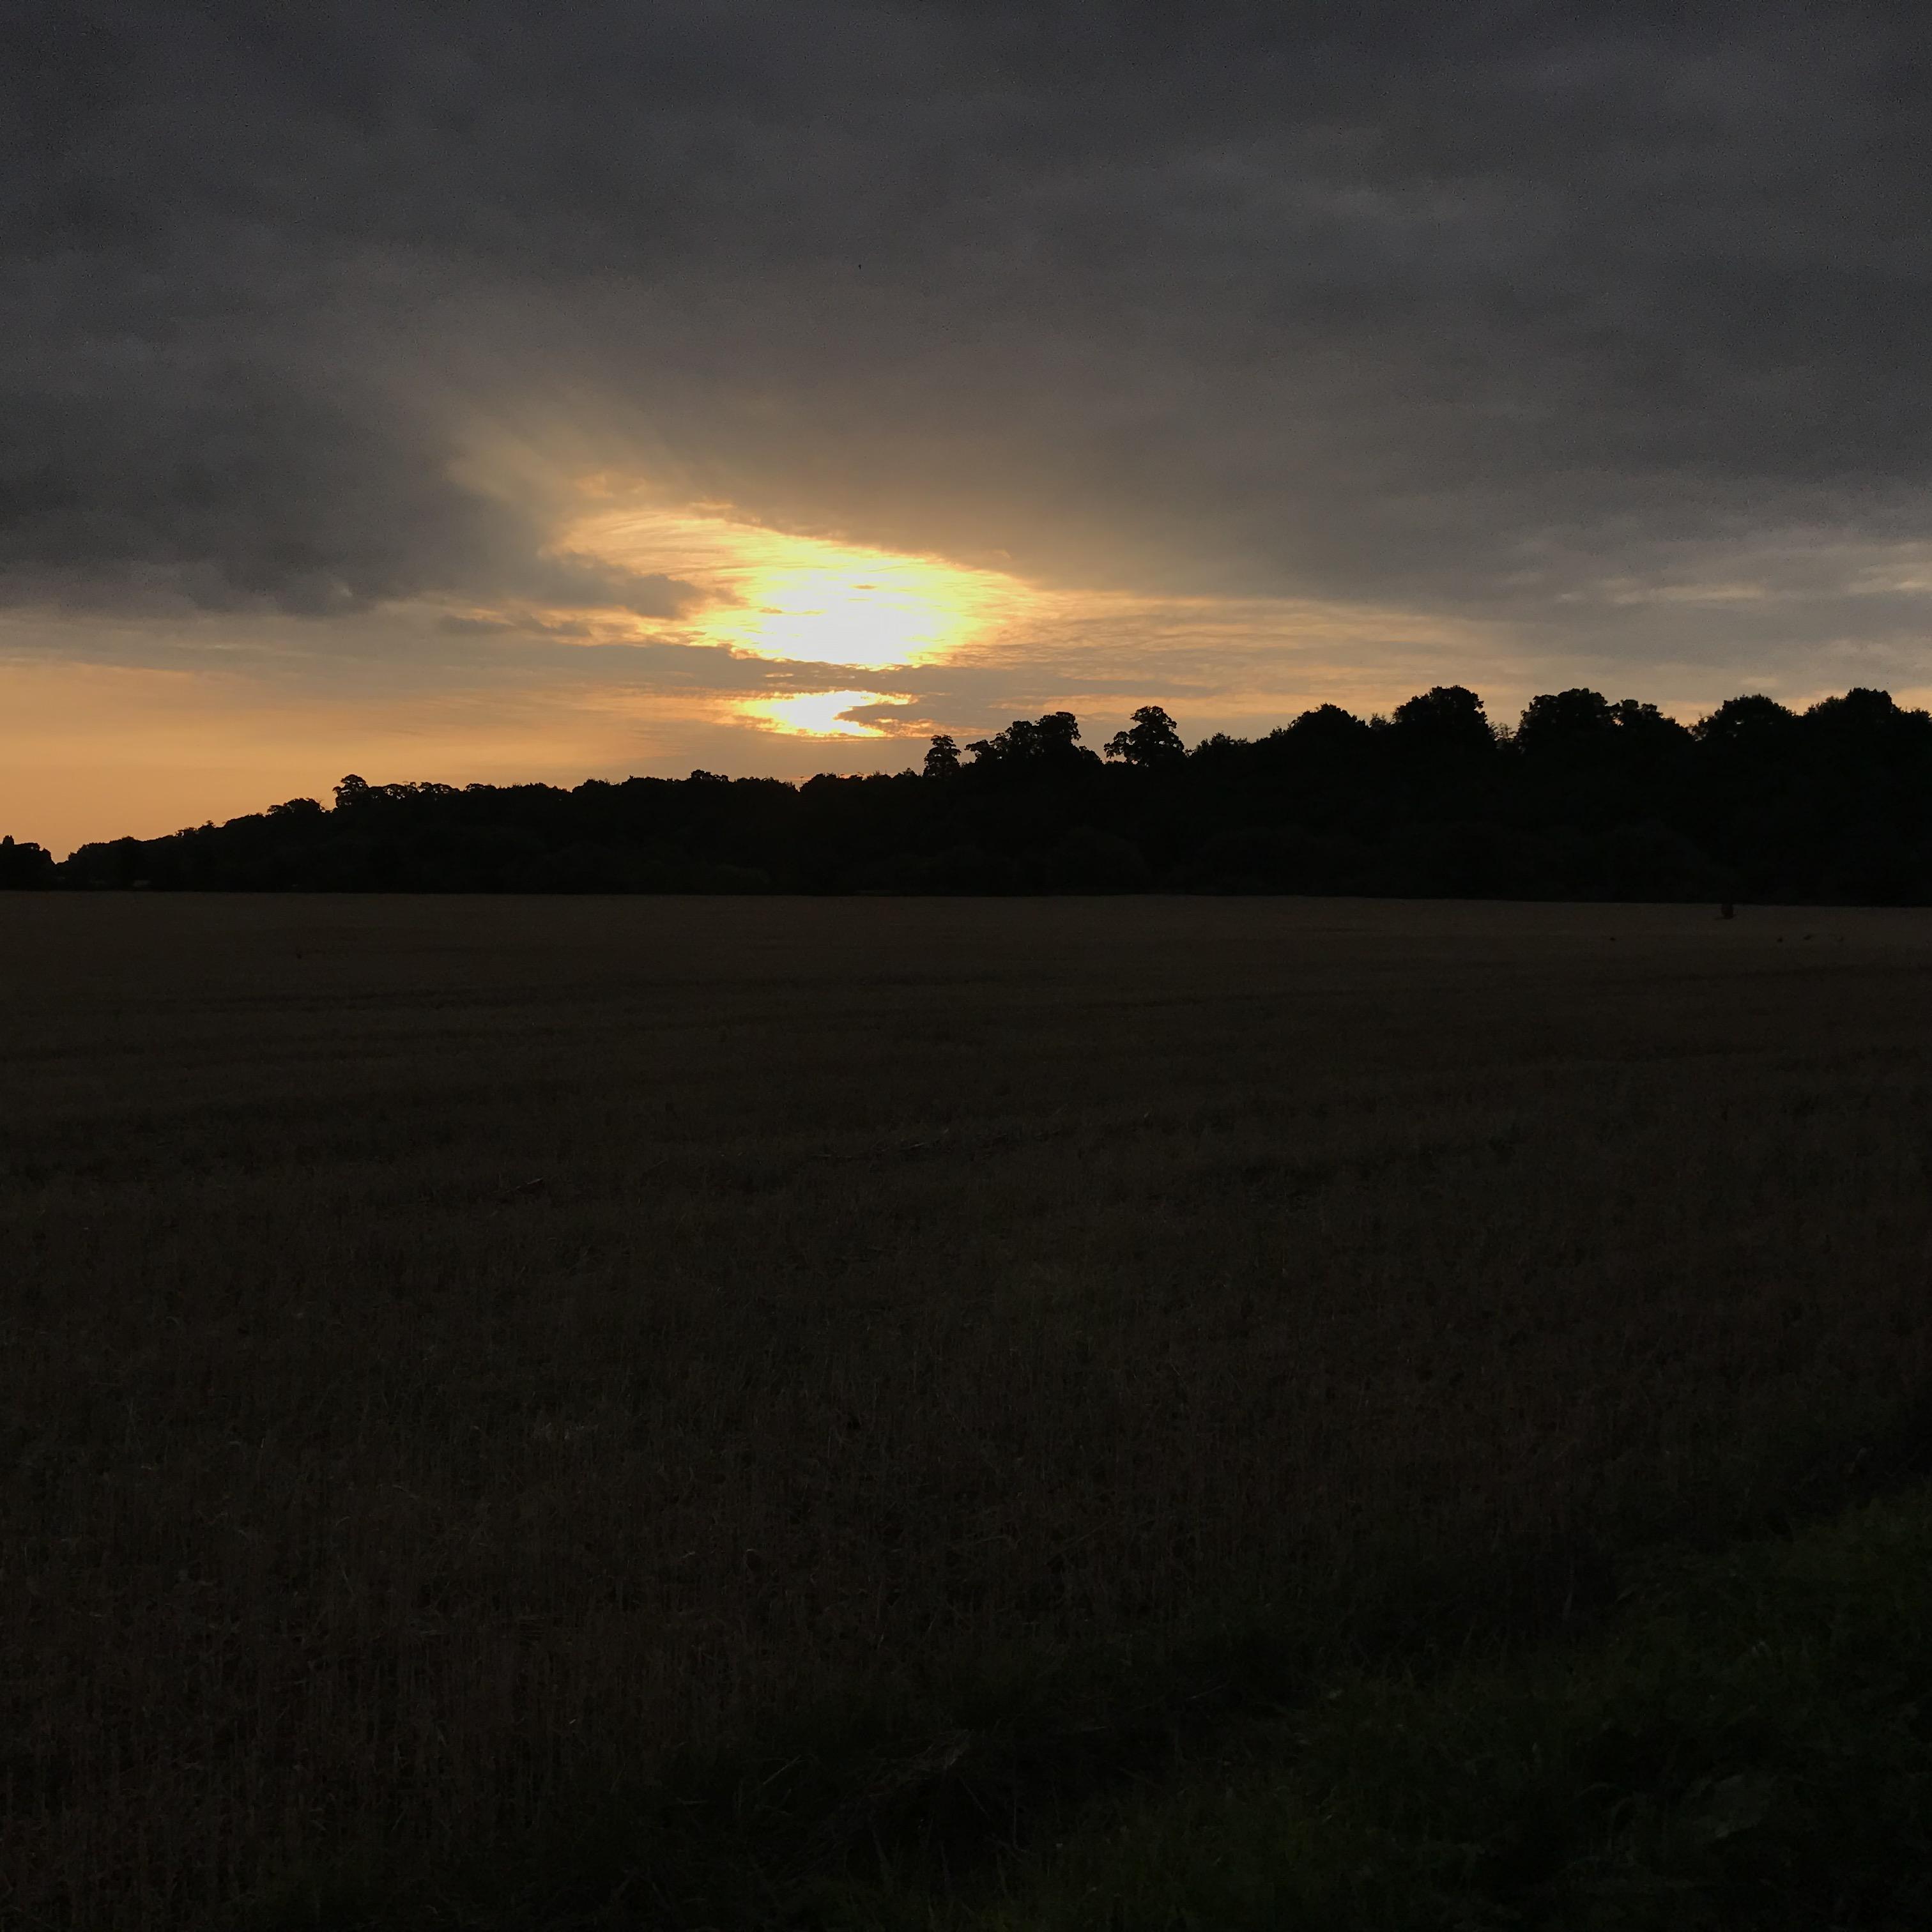 Sun rising over a field in Beeston